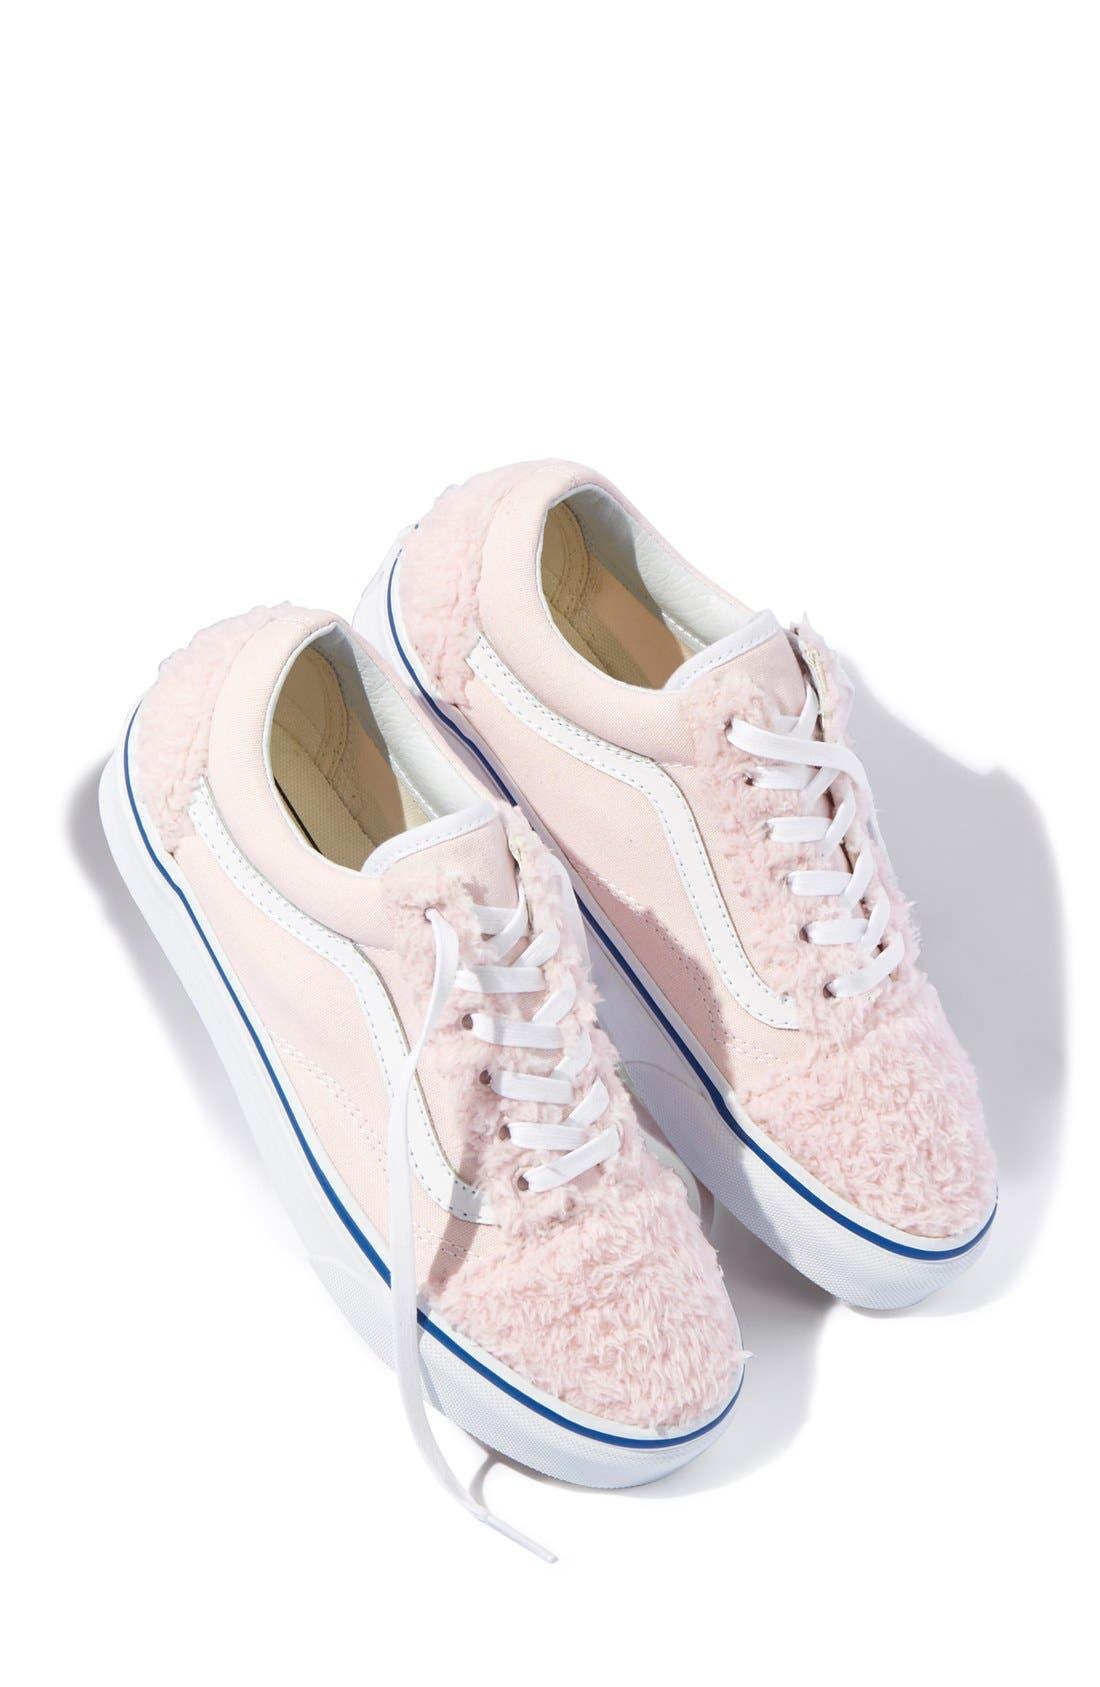 Main Image - Vans 'Old Skool' Faux Shearling & Canvas Sneaker (Unisex) (Nordstrom Exclusive)